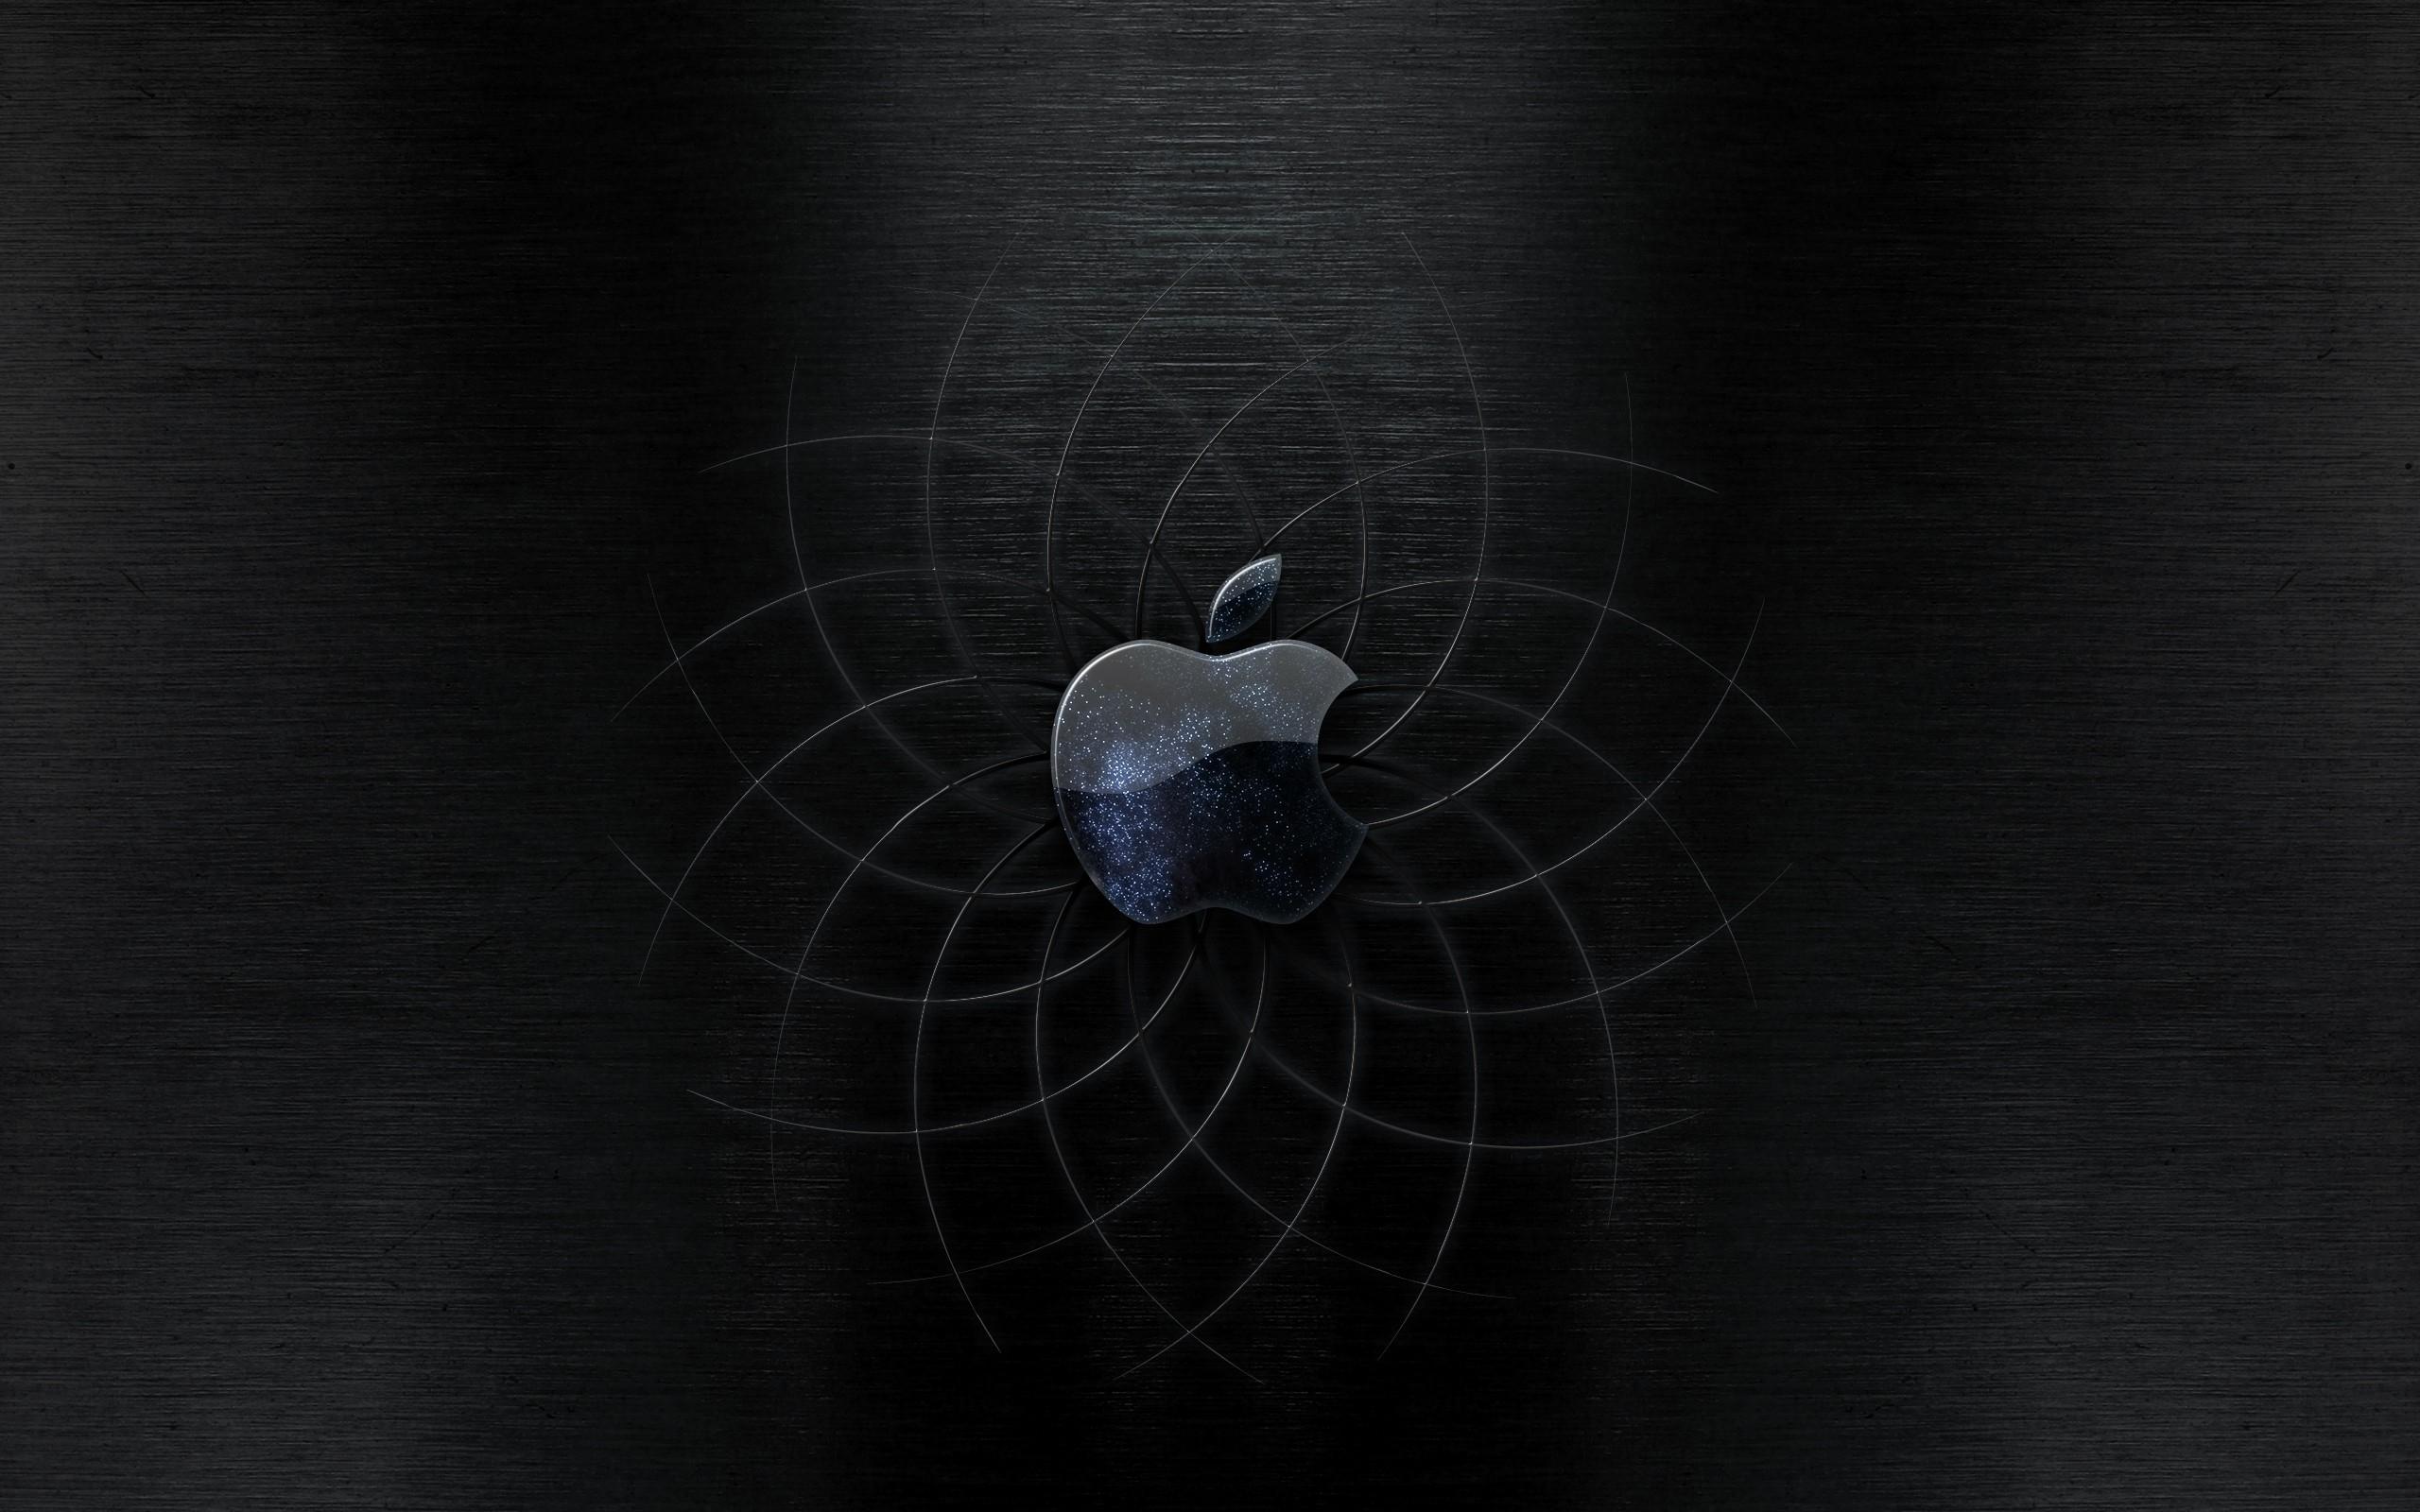 Apple logo Mac Wallpaper Download | Free Mac Wallpapers ...